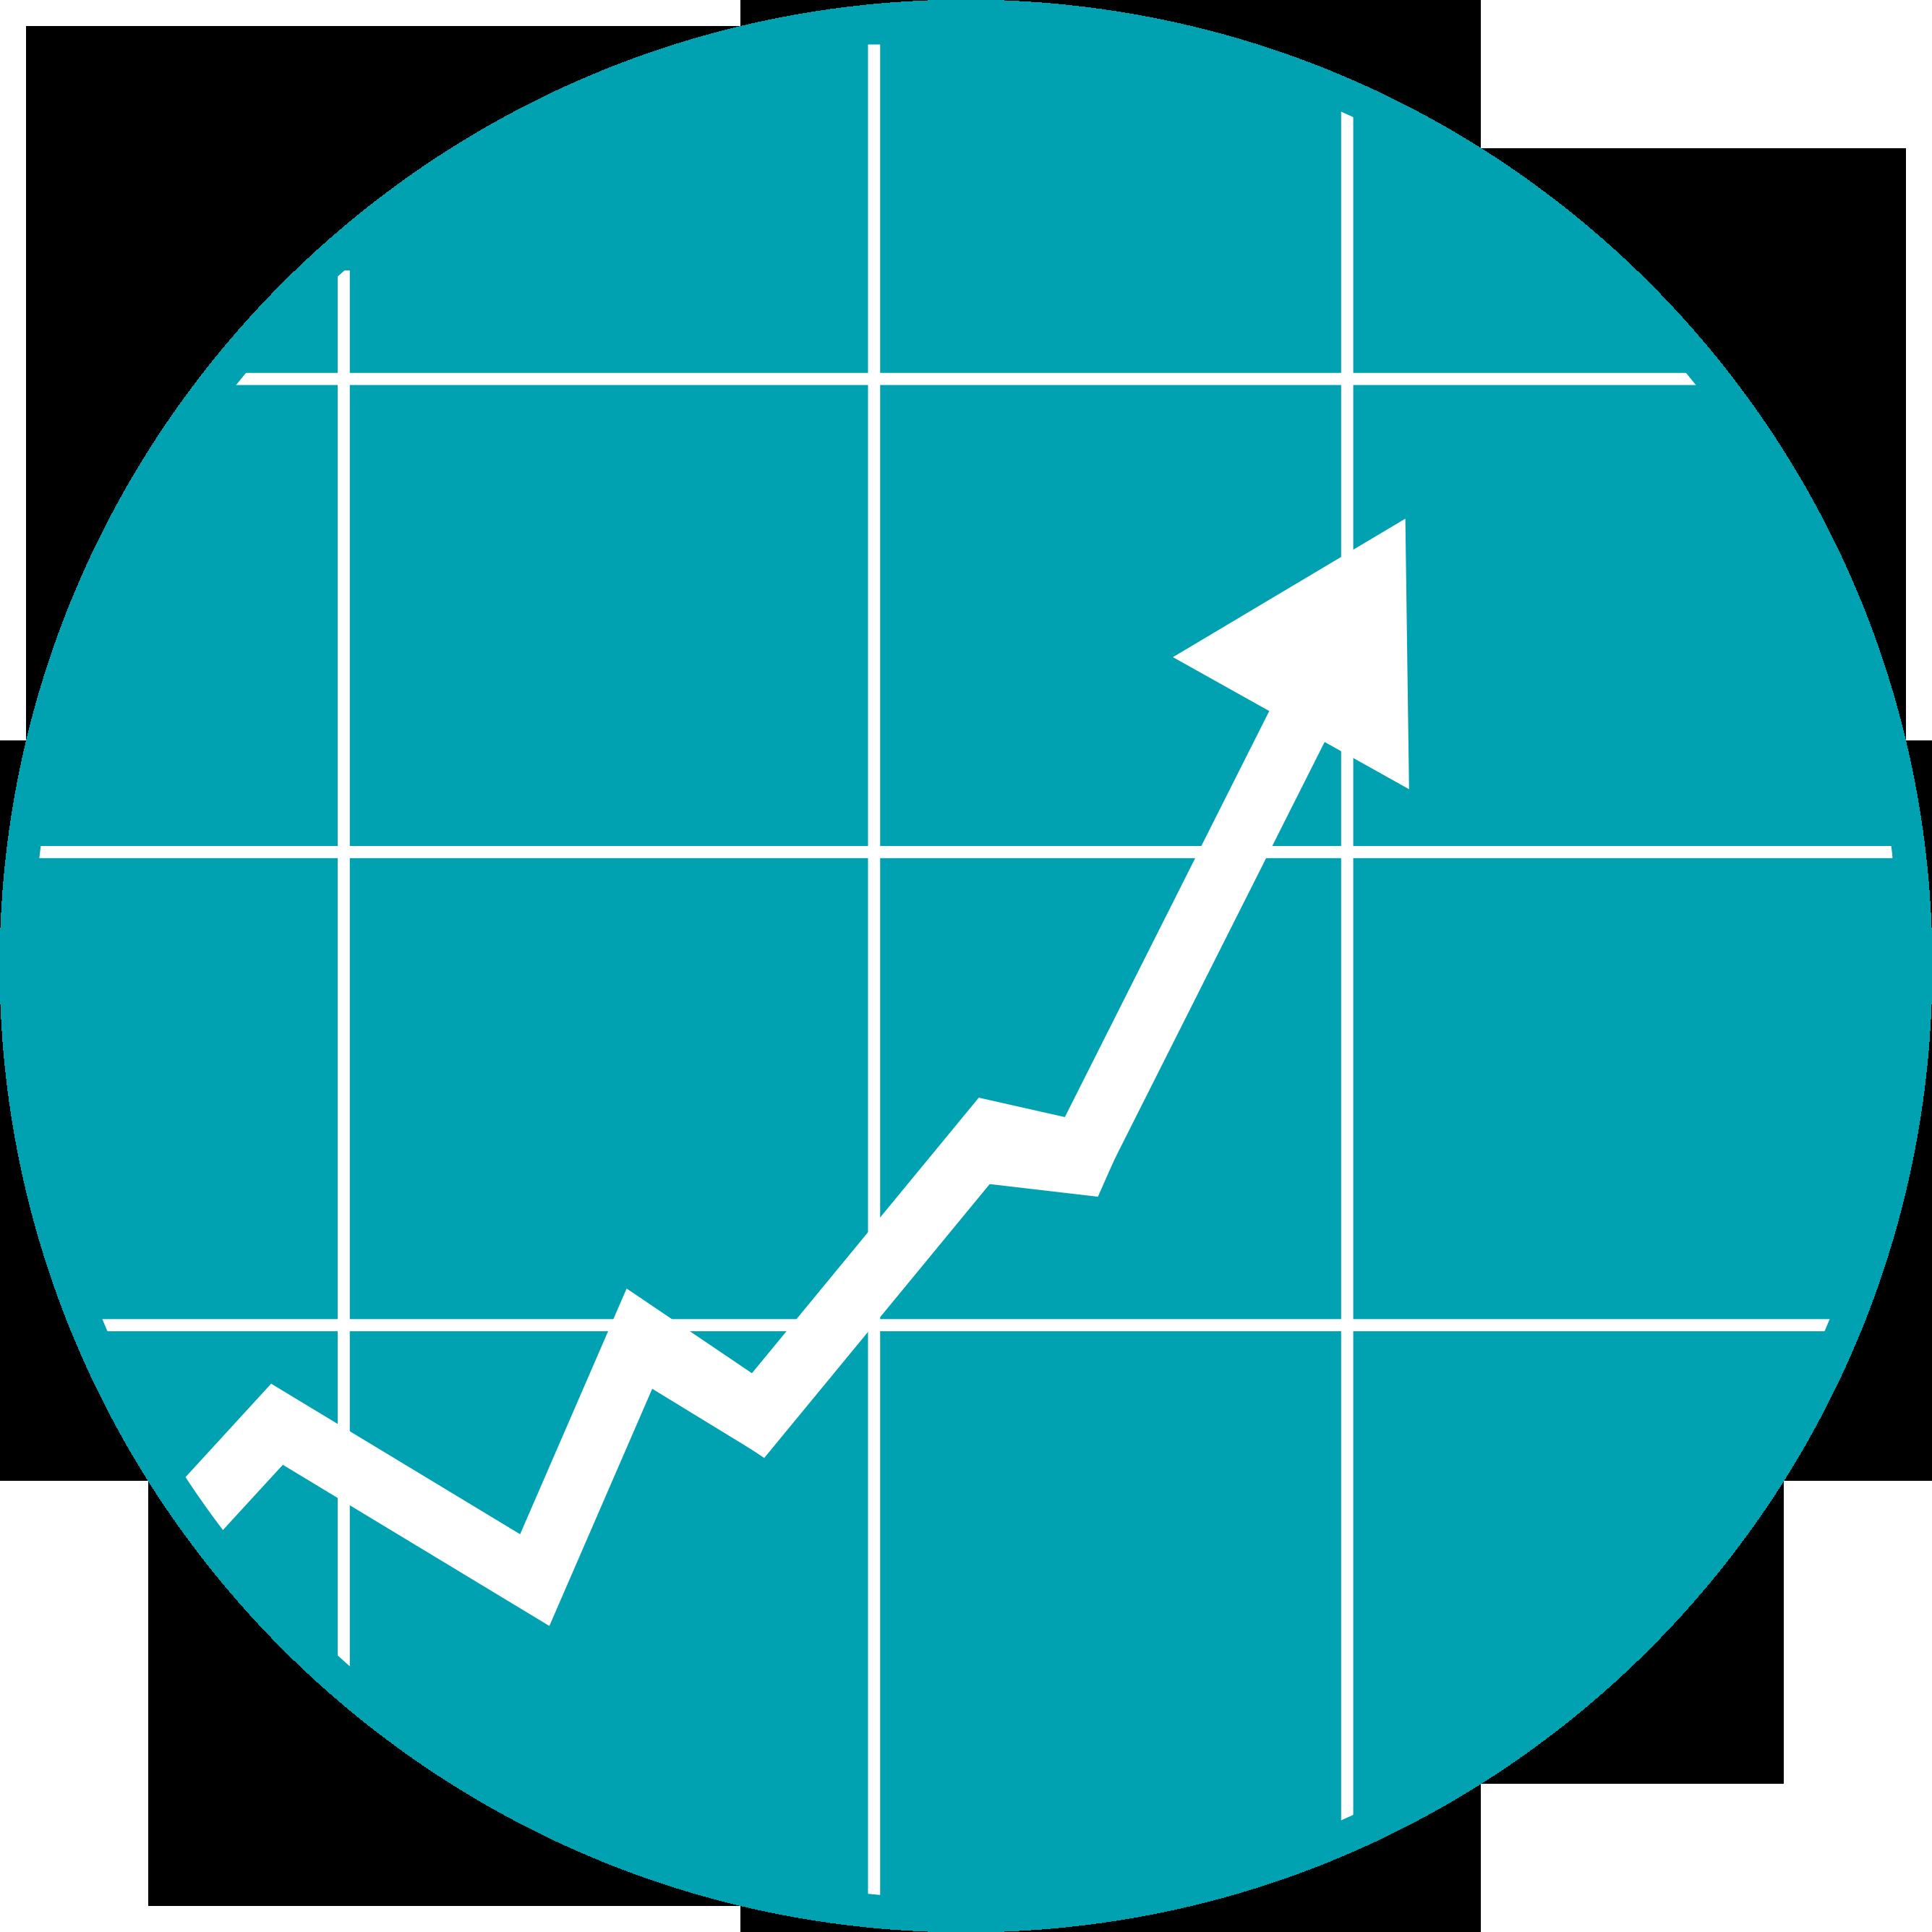 Refresh Icon On Lication Window Stock Vector